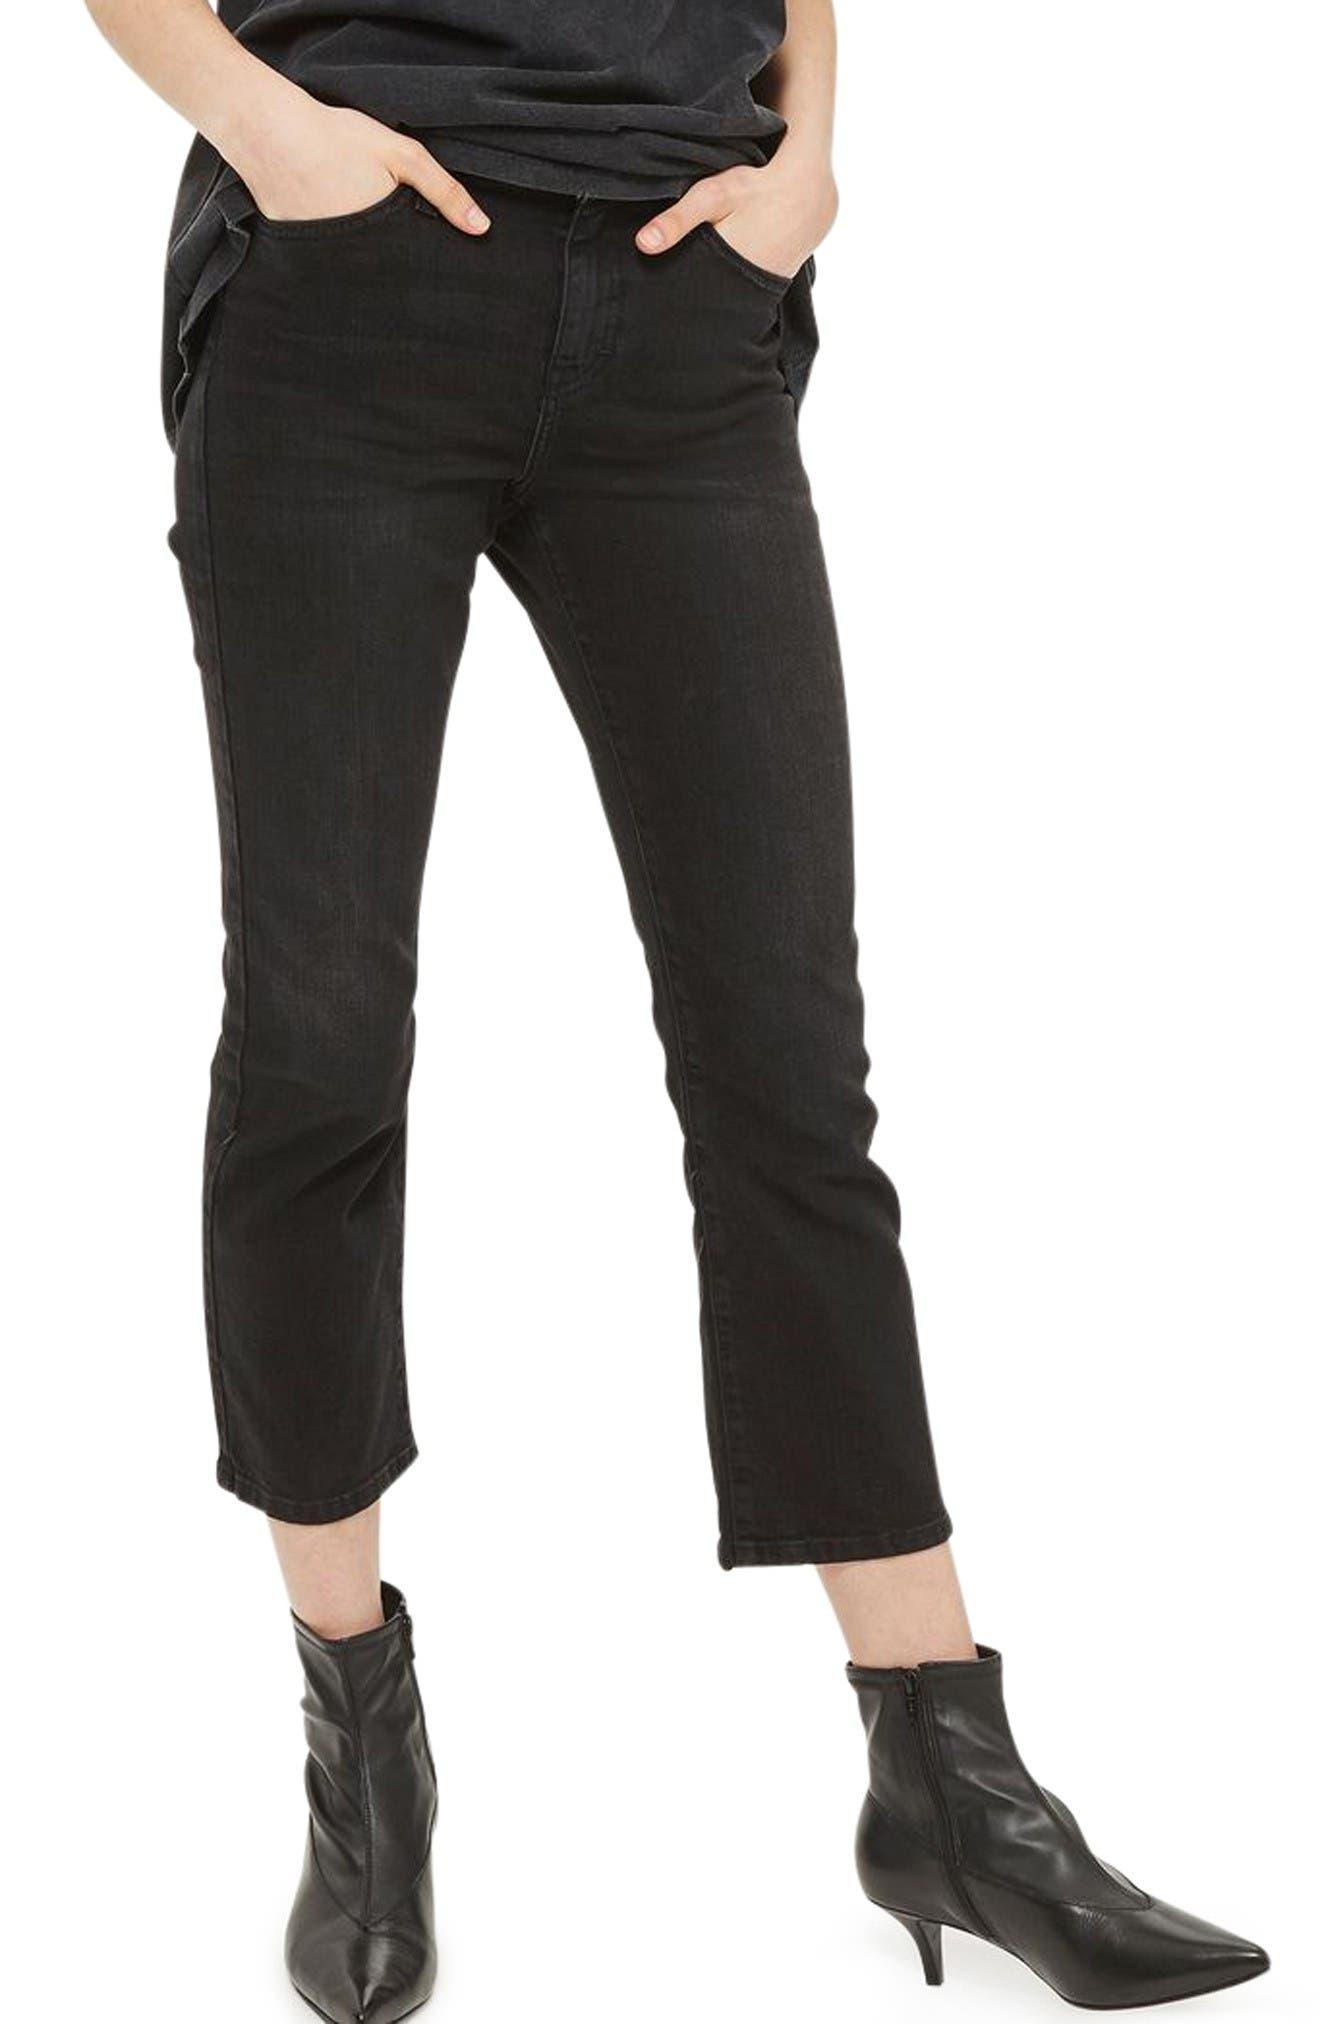 Dree Kick Flare Jeans,                         Main,                         color, Washed Black